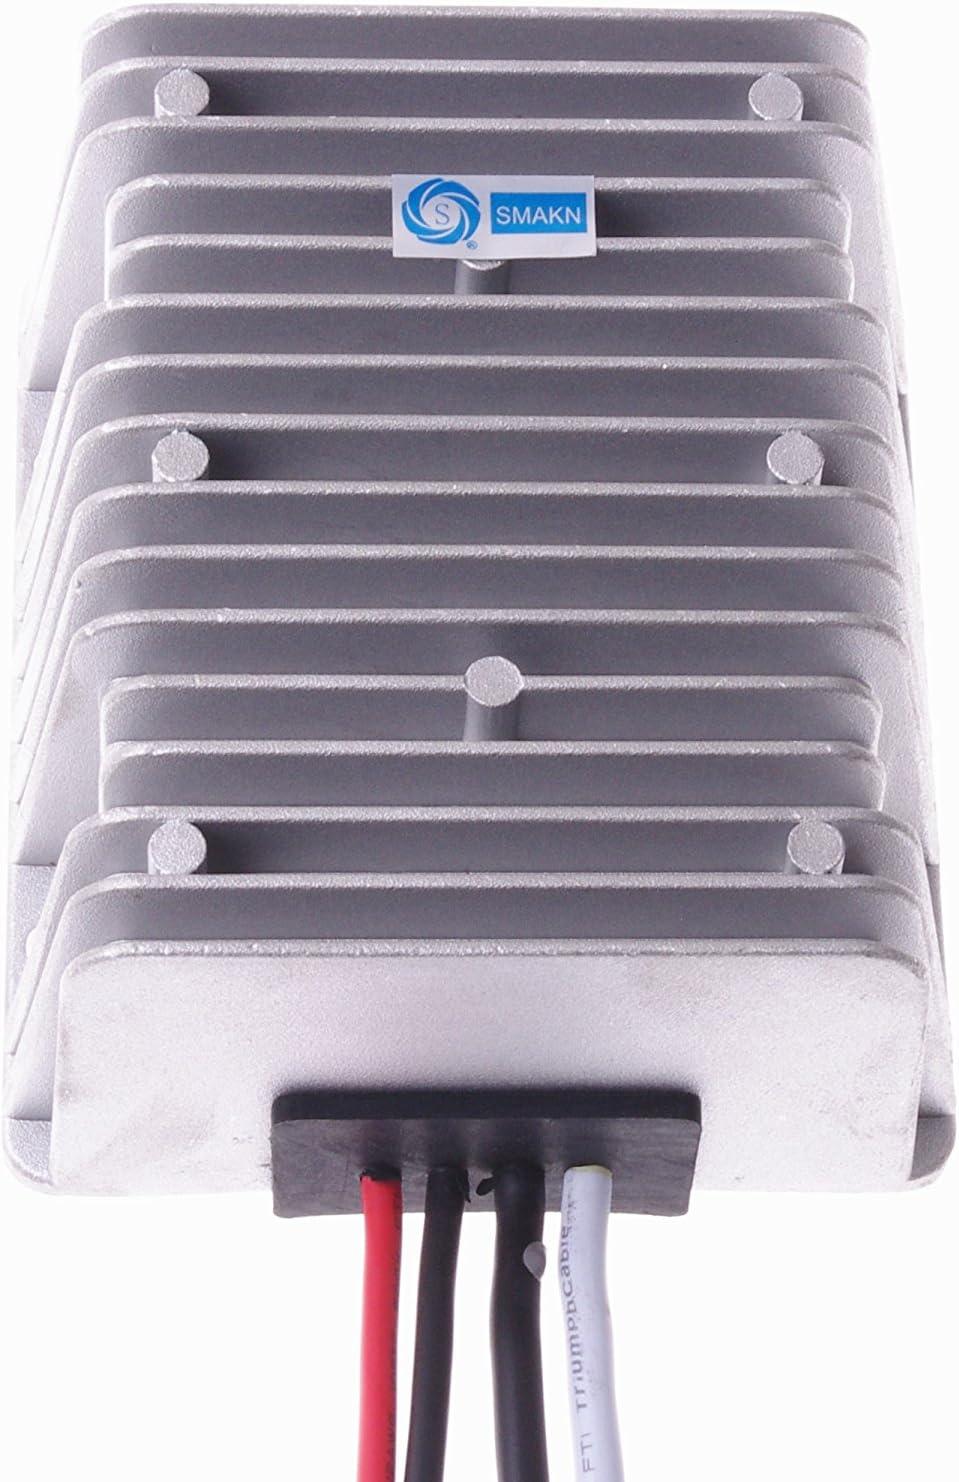 SMAKN DC-DC Converter Step-Down Buck Module 24V 36V (16-36V) to 12V 40A 480W waterproof power converter